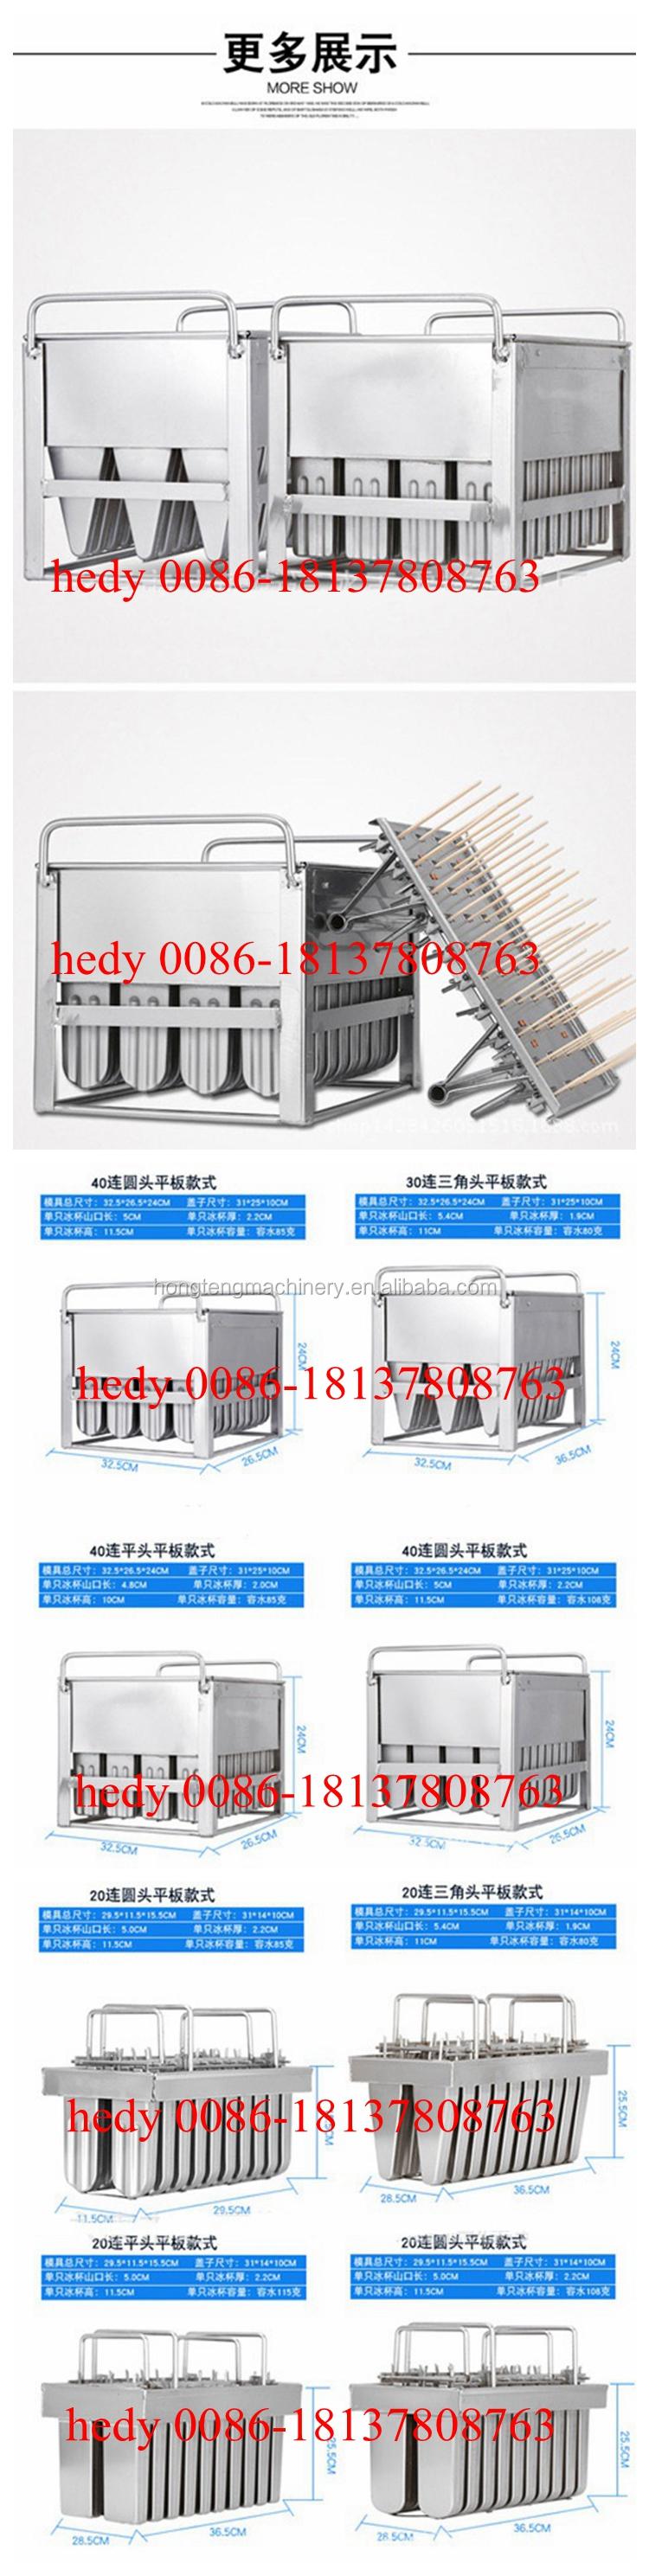 popsicle machine (5).jpg